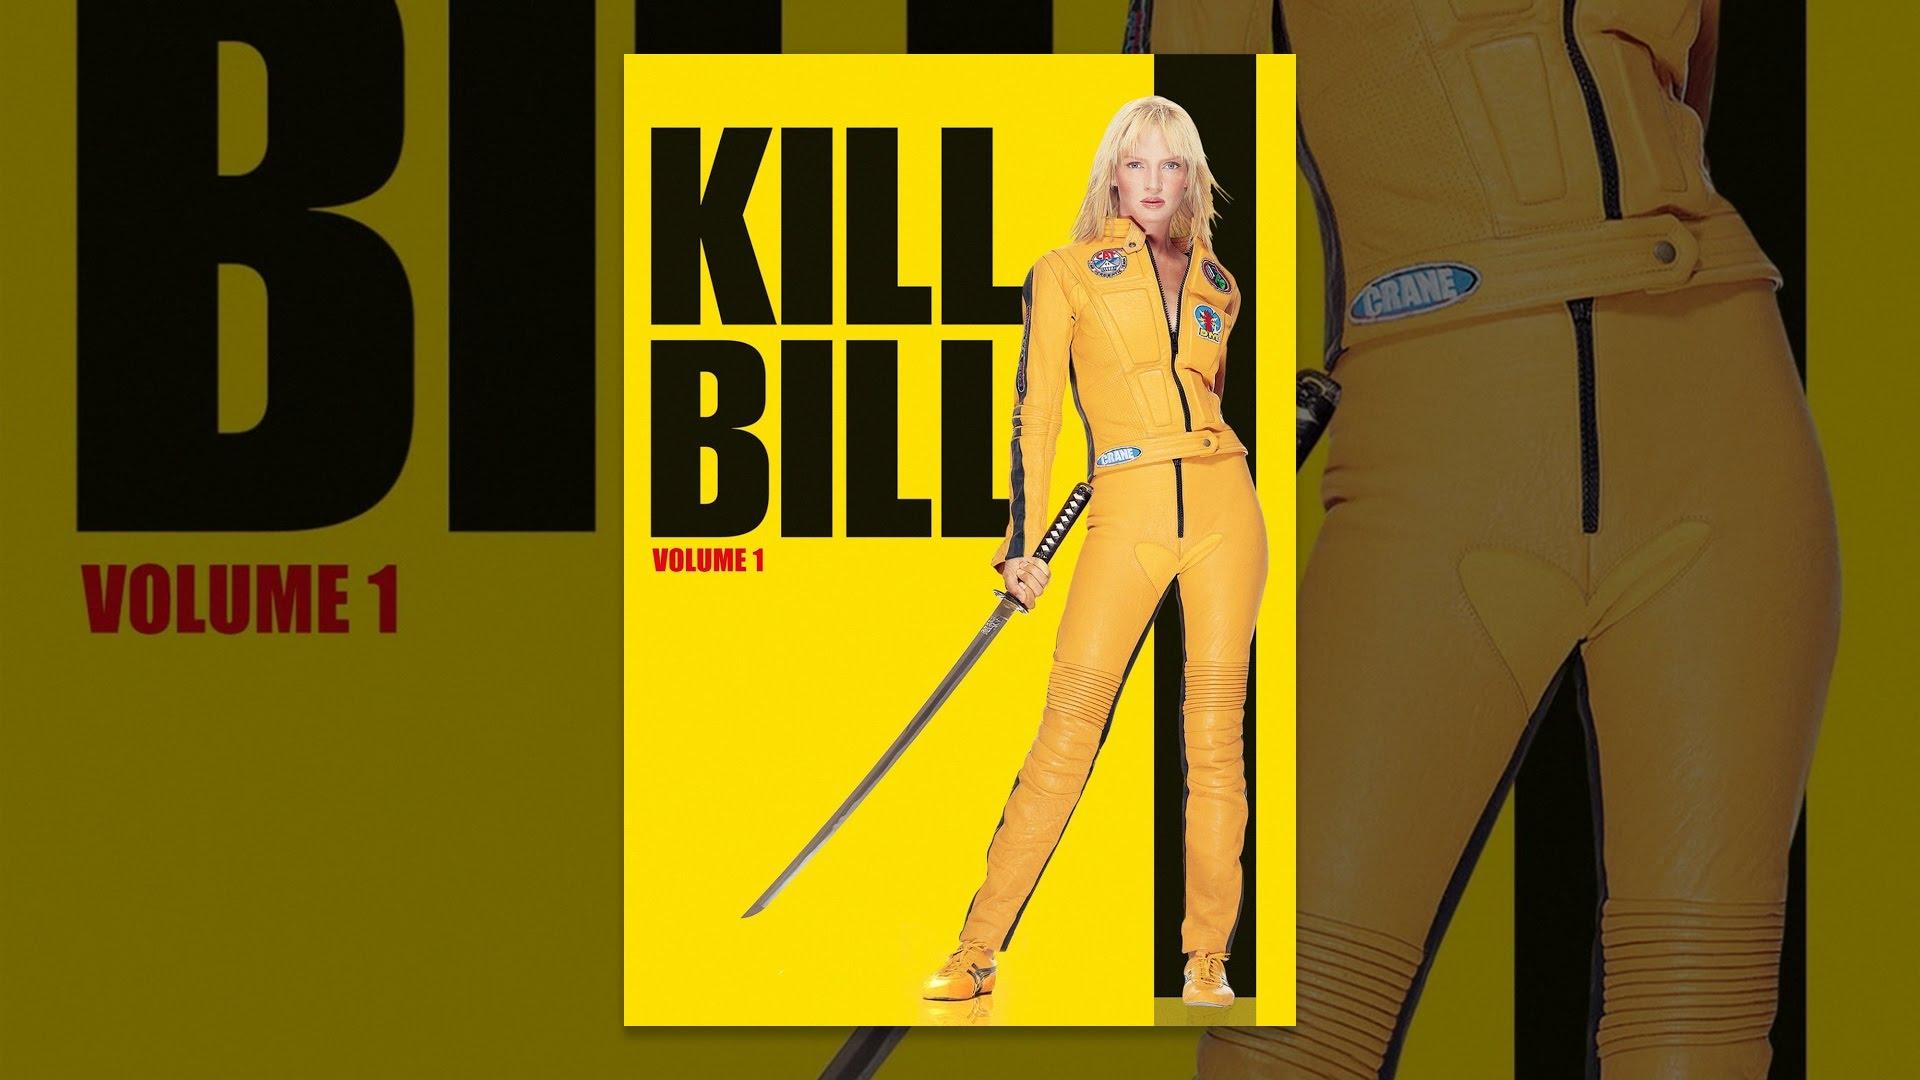 th? m?vi? kill bill v?lum? 1 essay Kill bill: vol 1 & vol 2 transcript, name on his driver's license was charles arthur plympton, but for some reason he preferred arthur,he continues wiping.